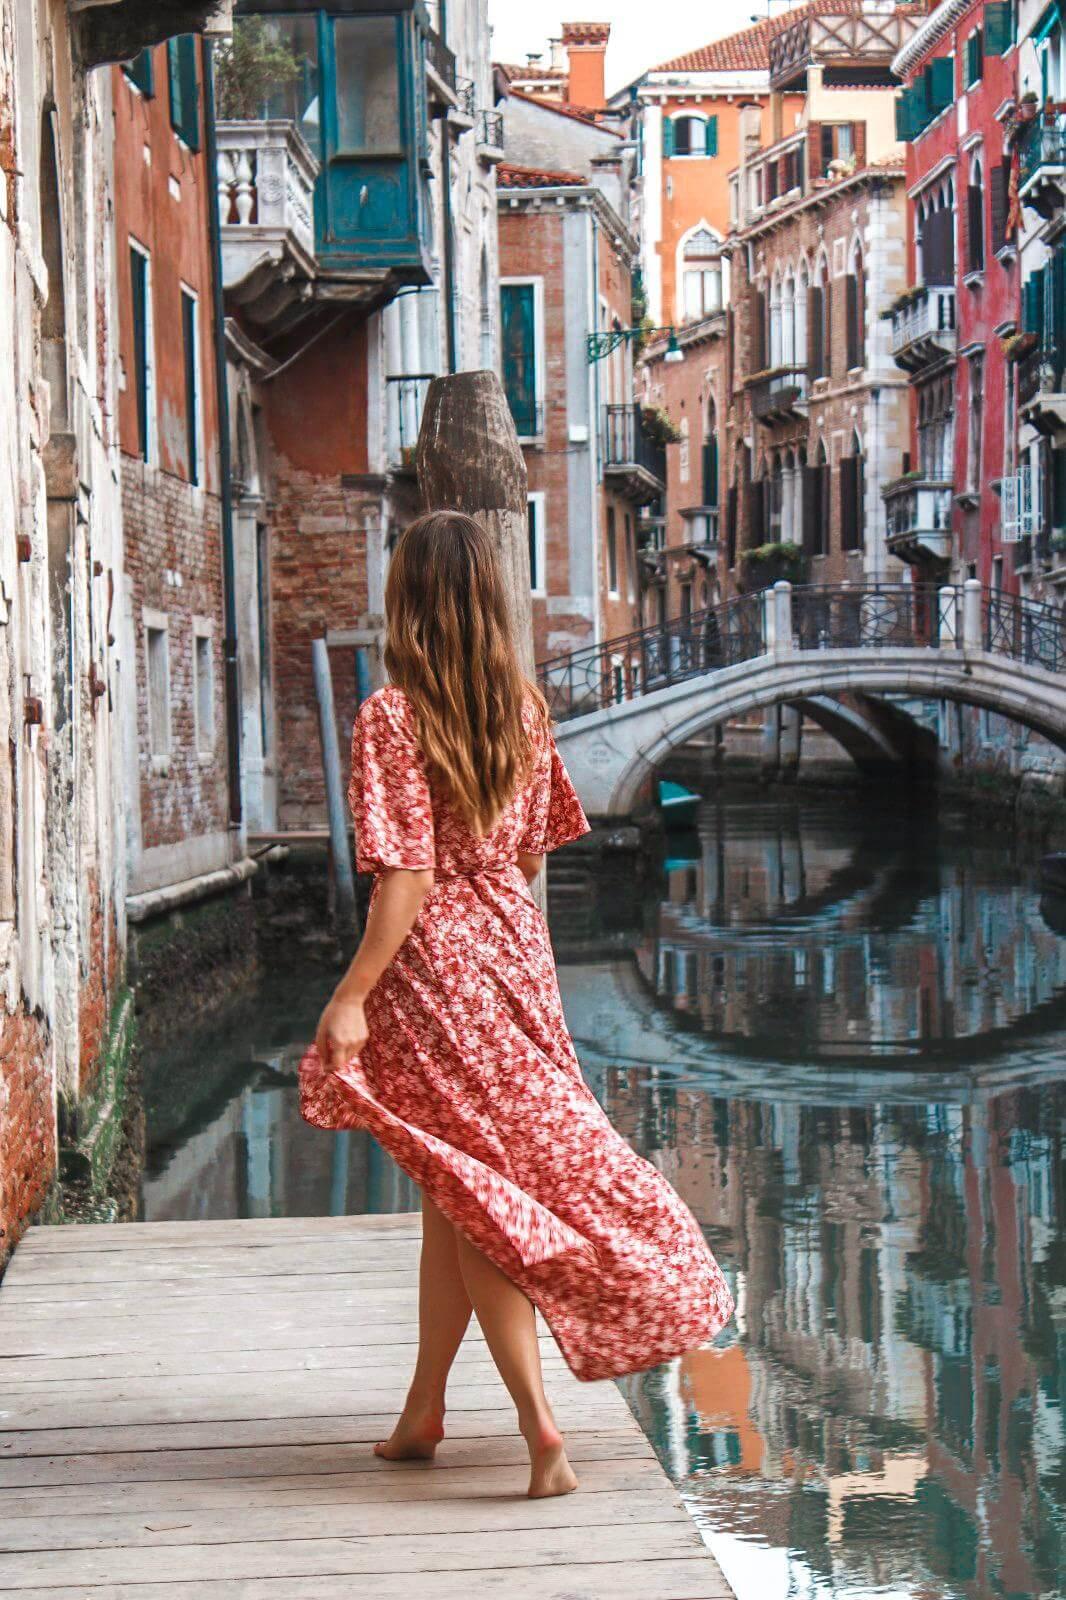 Die 5 schönsten Sehenswürdigkeiten & Fotolocations in Venedig & Wie du den Touristenandrang in Venedig umgehst